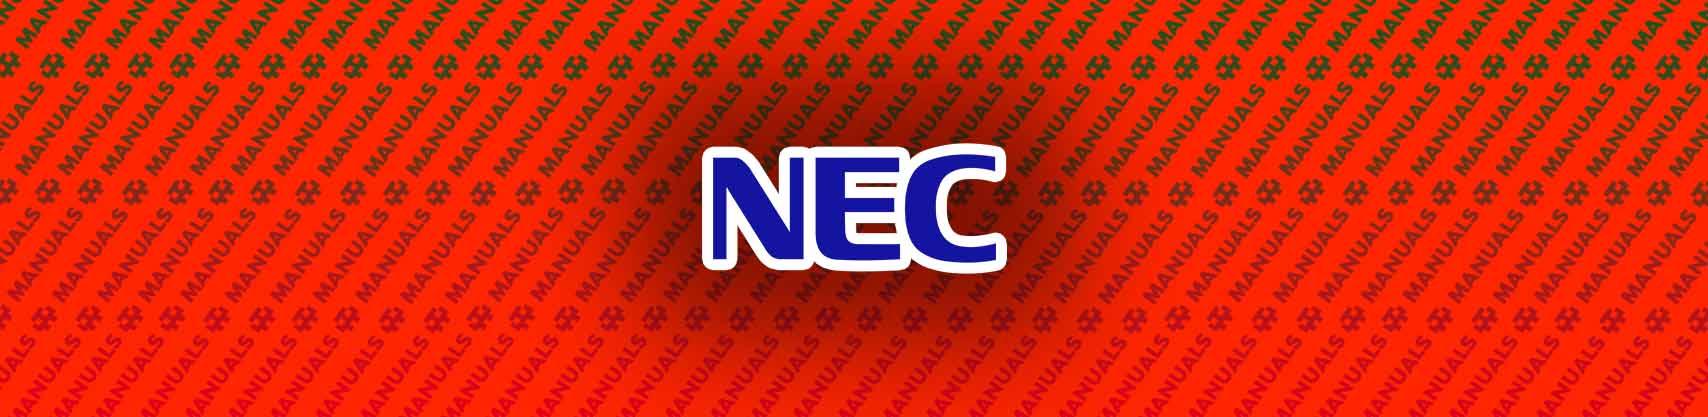 NEC SL2100 Manual